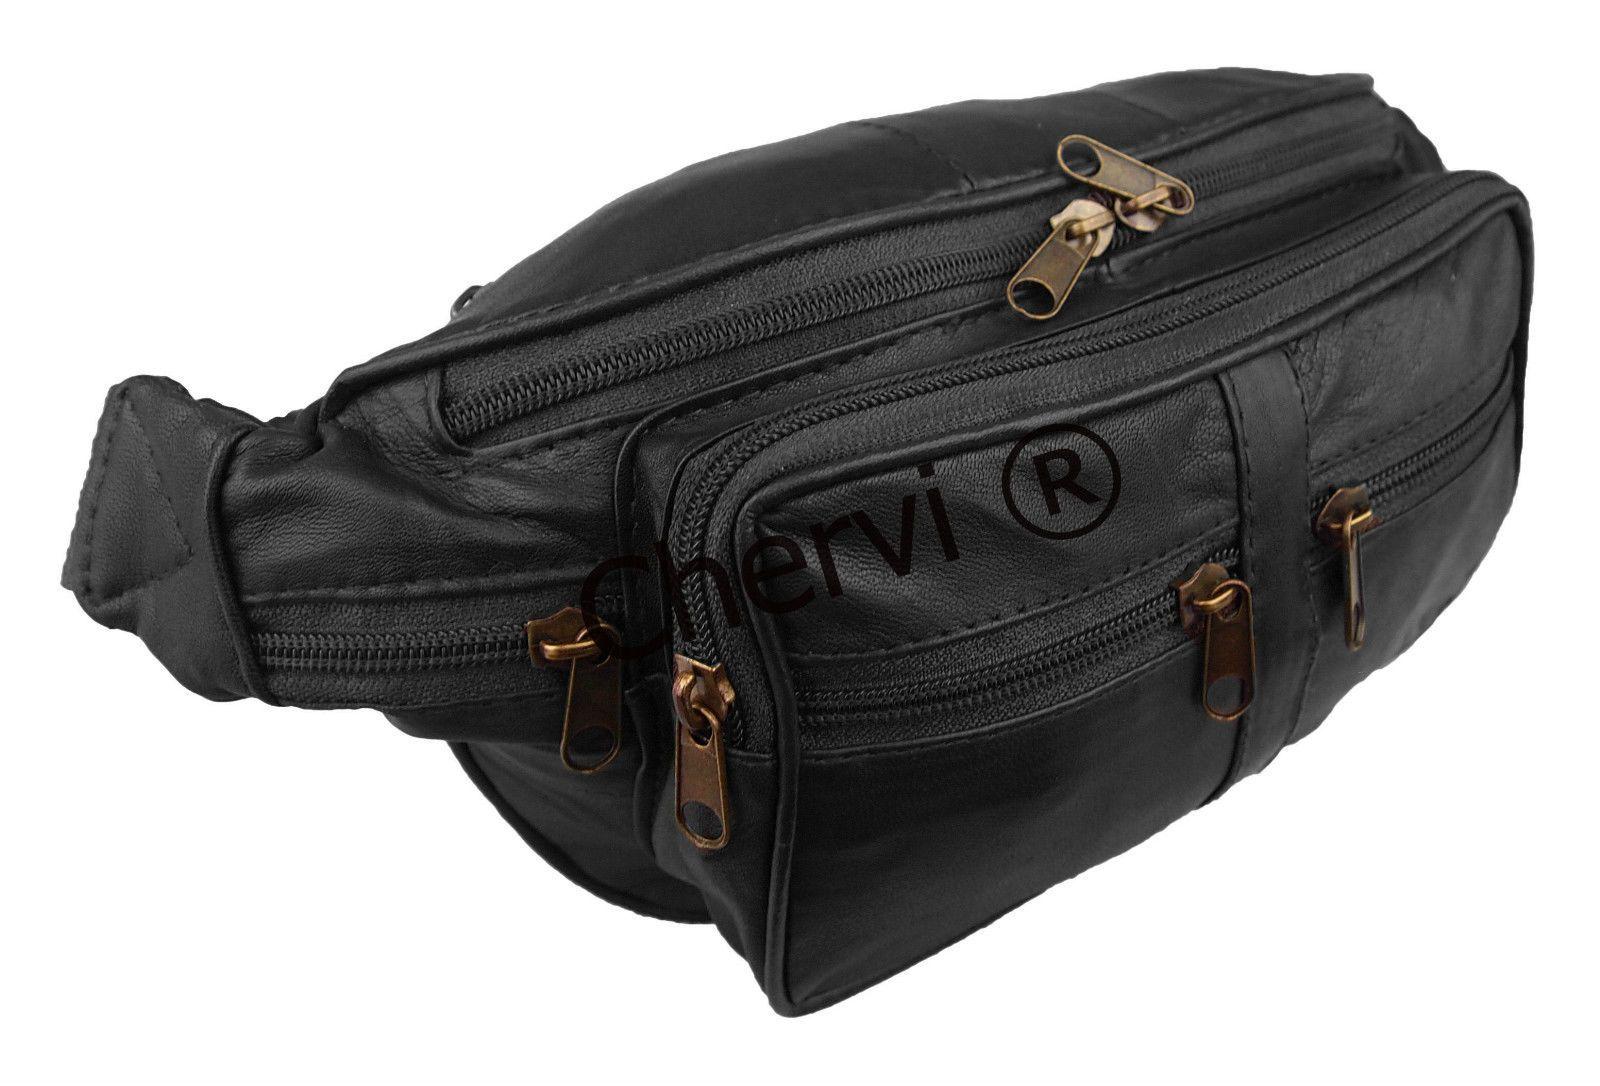 bumbag | Butch Bæltetaske /Cykel-venlig taske | Pinterest | Dll, E ...